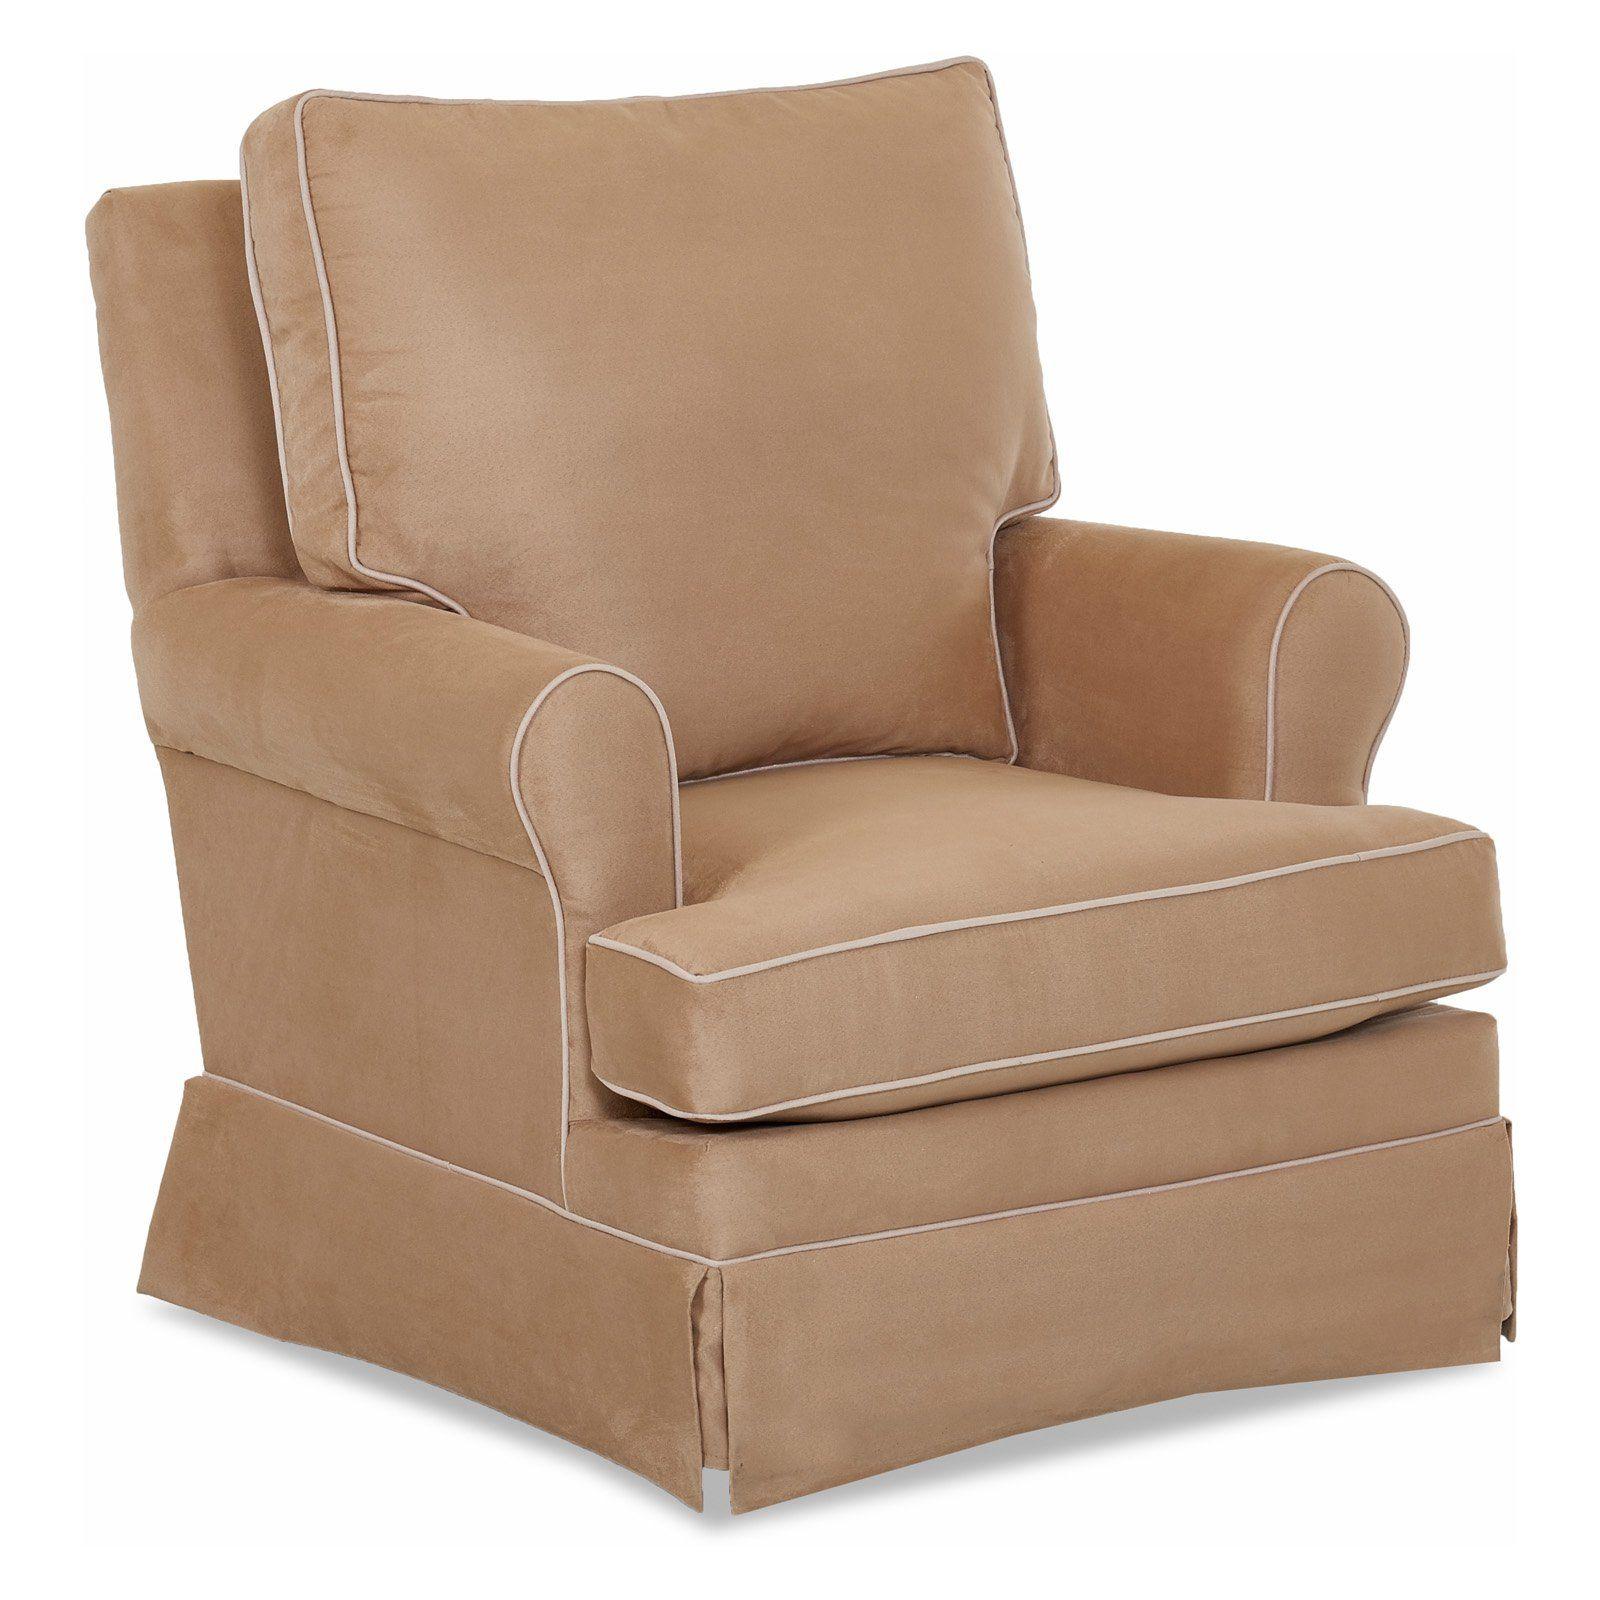 Marvelous Klaussner Gwinnett Swivel Gliding Rocker Khaki Microsuede Lamtechconsult Wood Chair Design Ideas Lamtechconsultcom